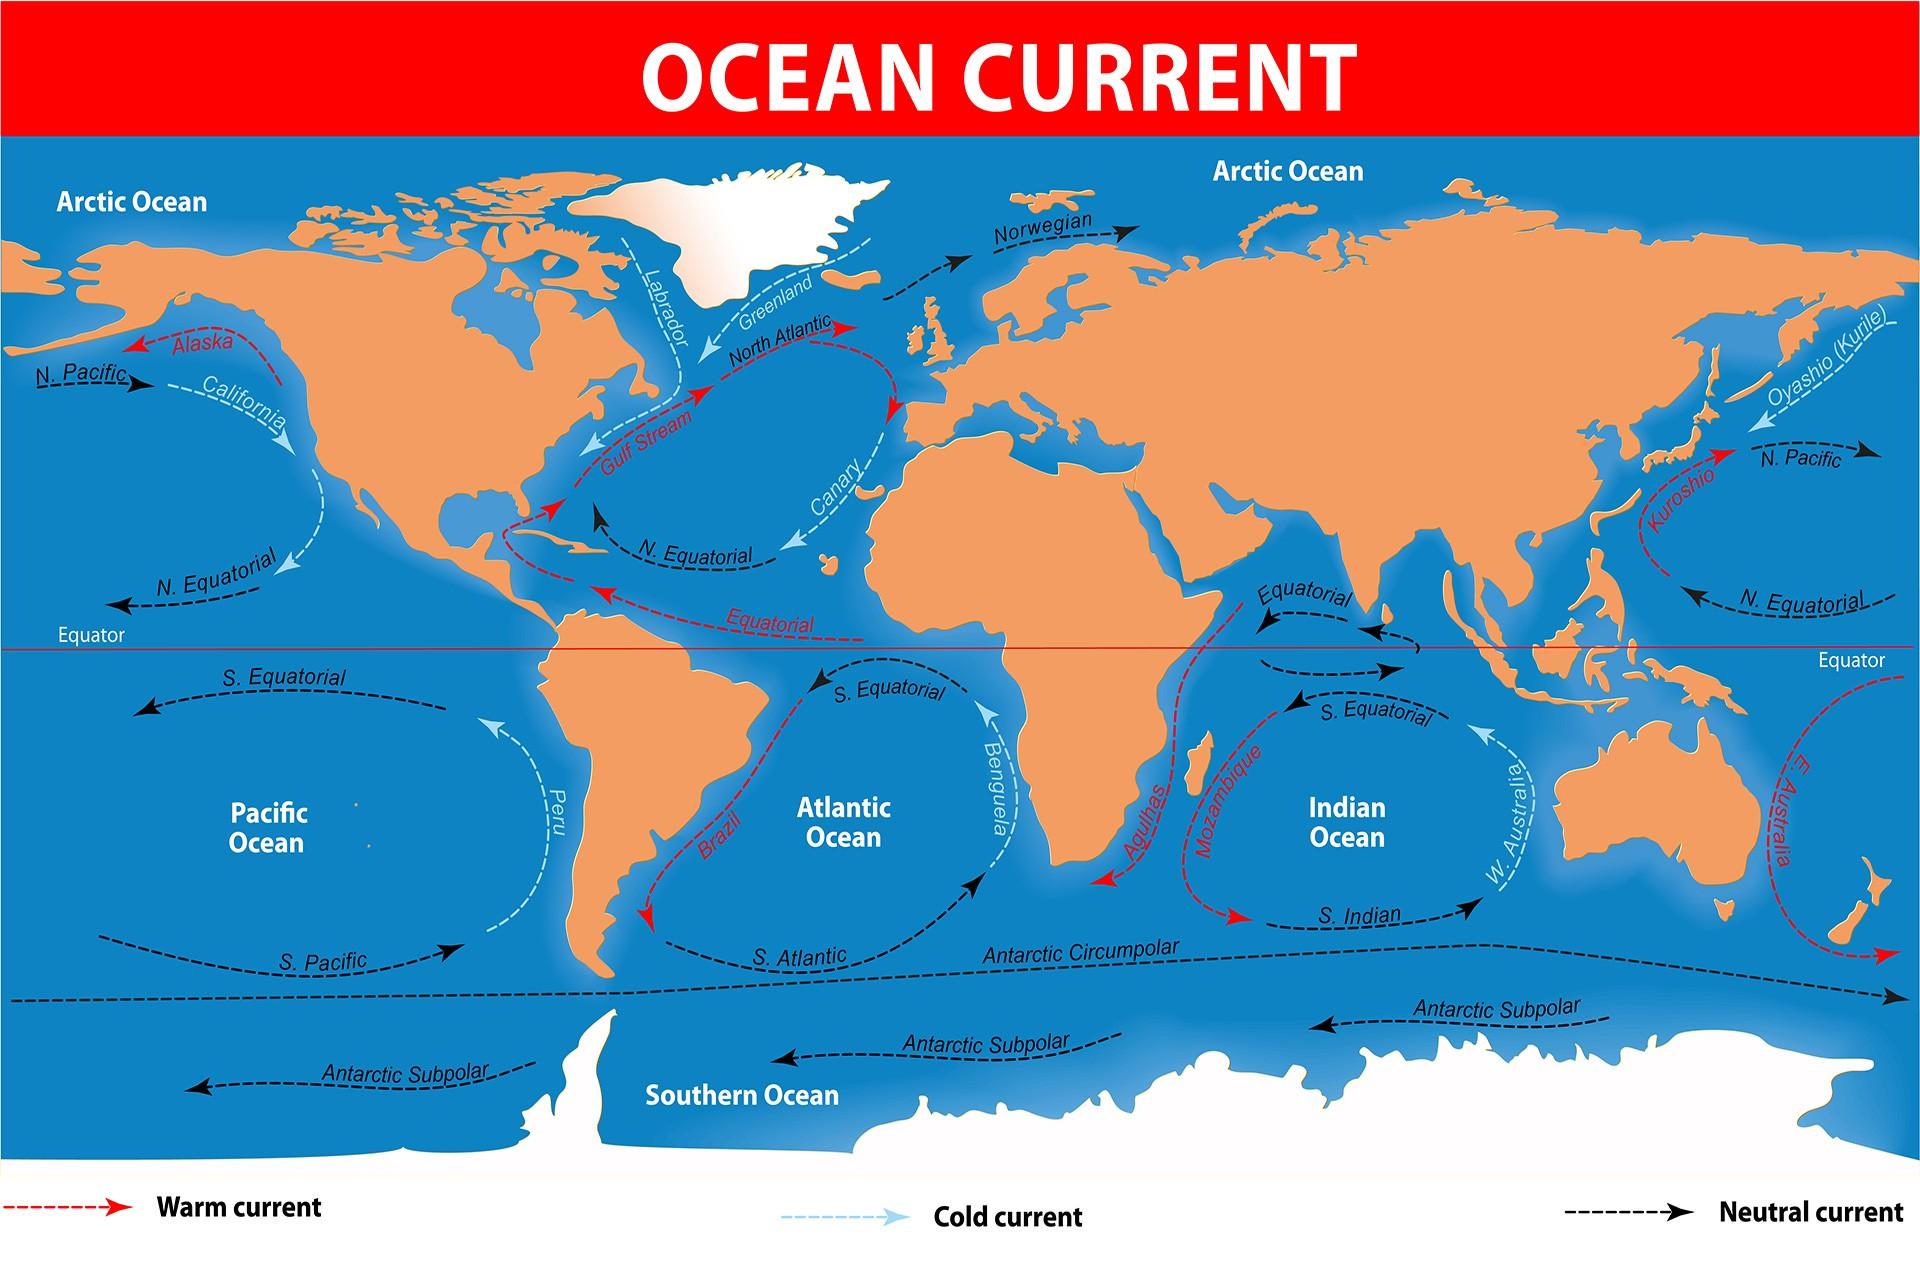 Wallpaper : illustration, sea, world map, continents ...